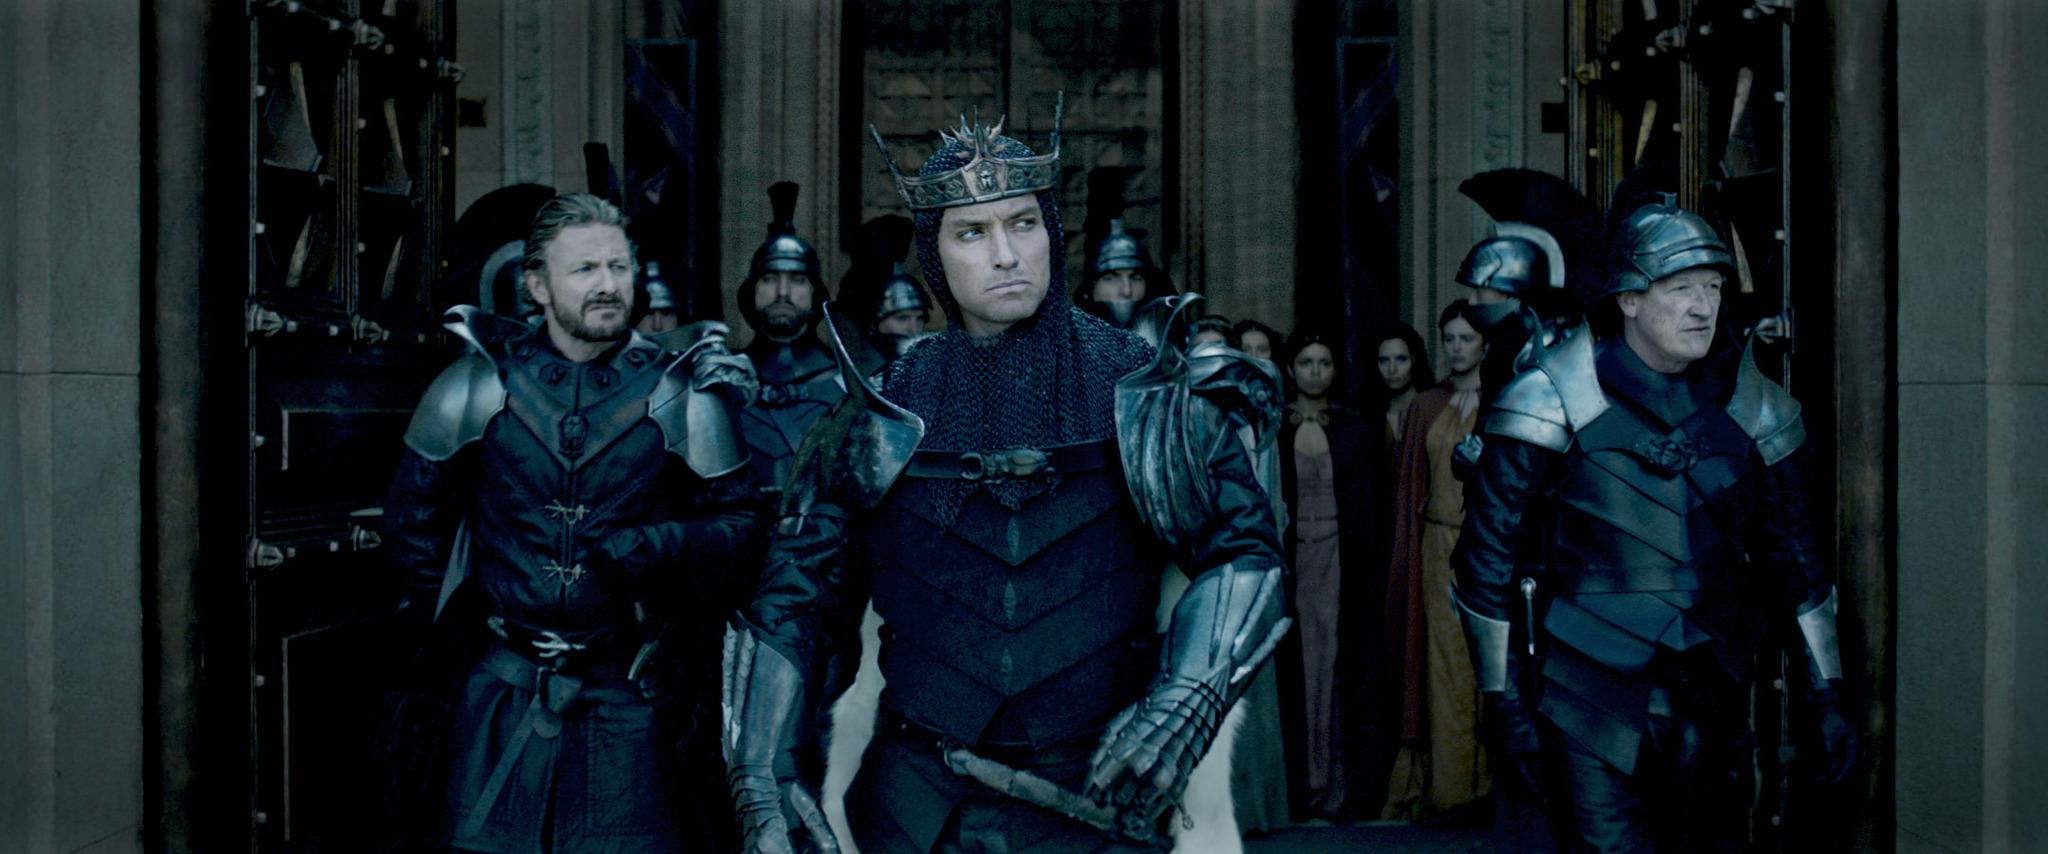 Jude Law, Peter Ferdinando, and Geoff Bell in King Arthur: Legend of the Sword (2017)